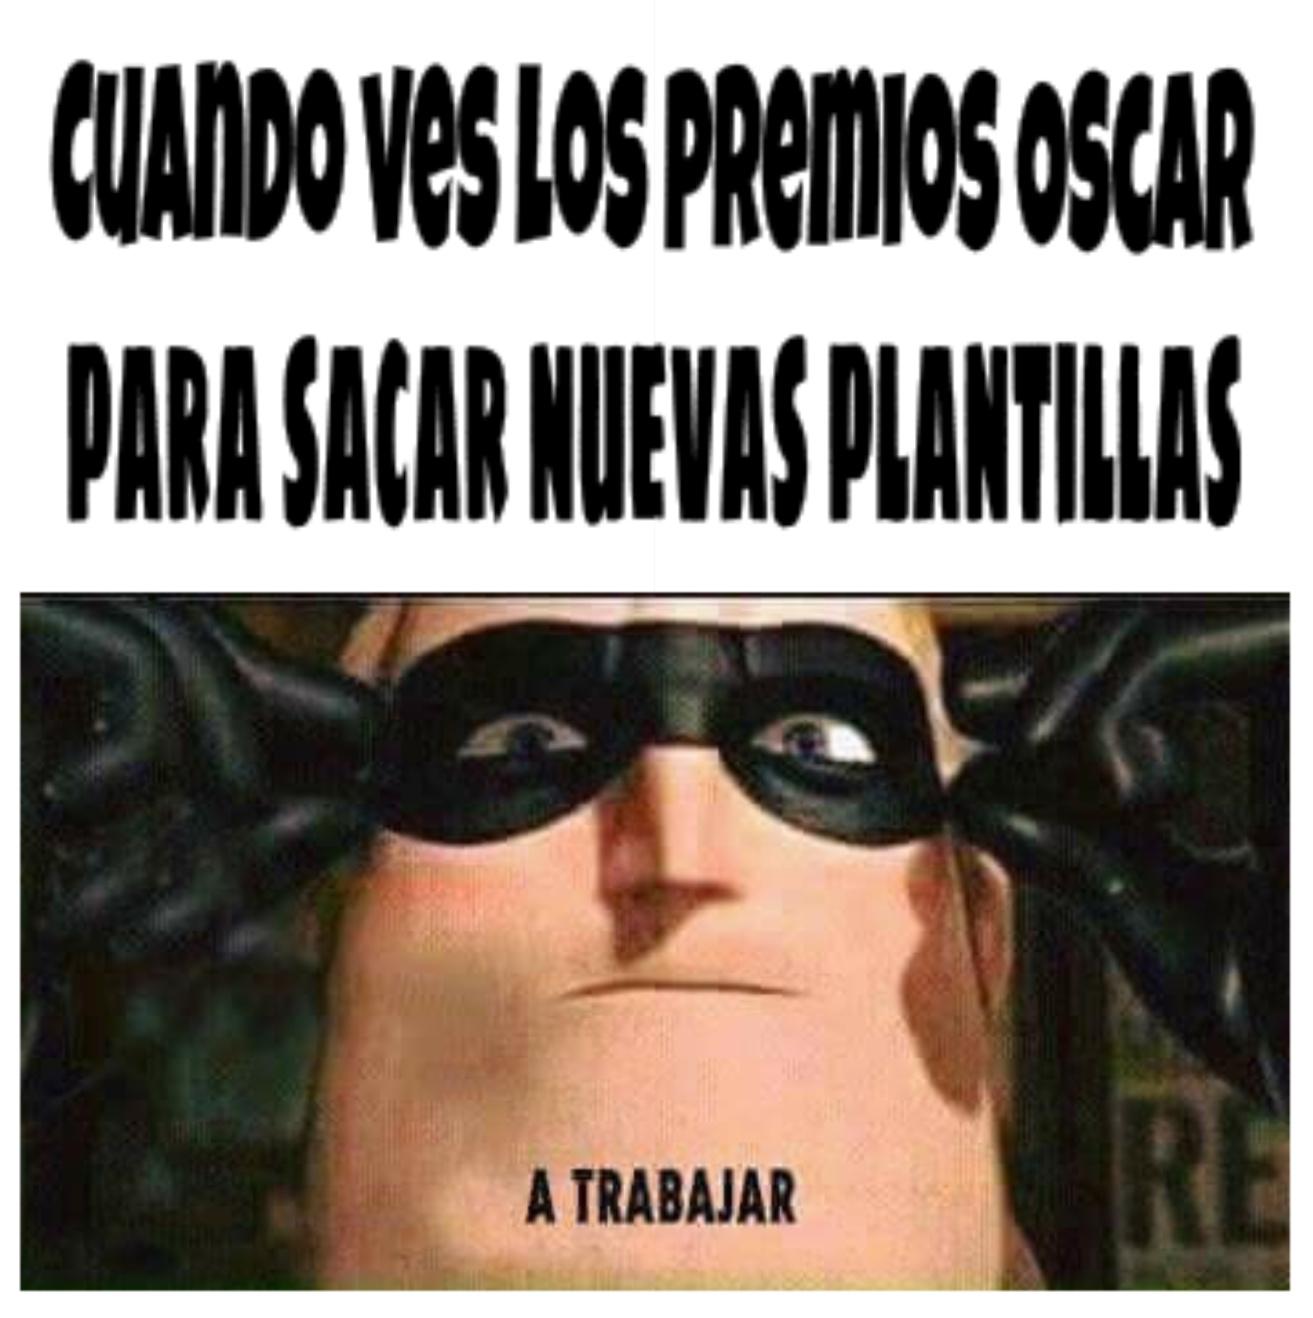 opscars - meme